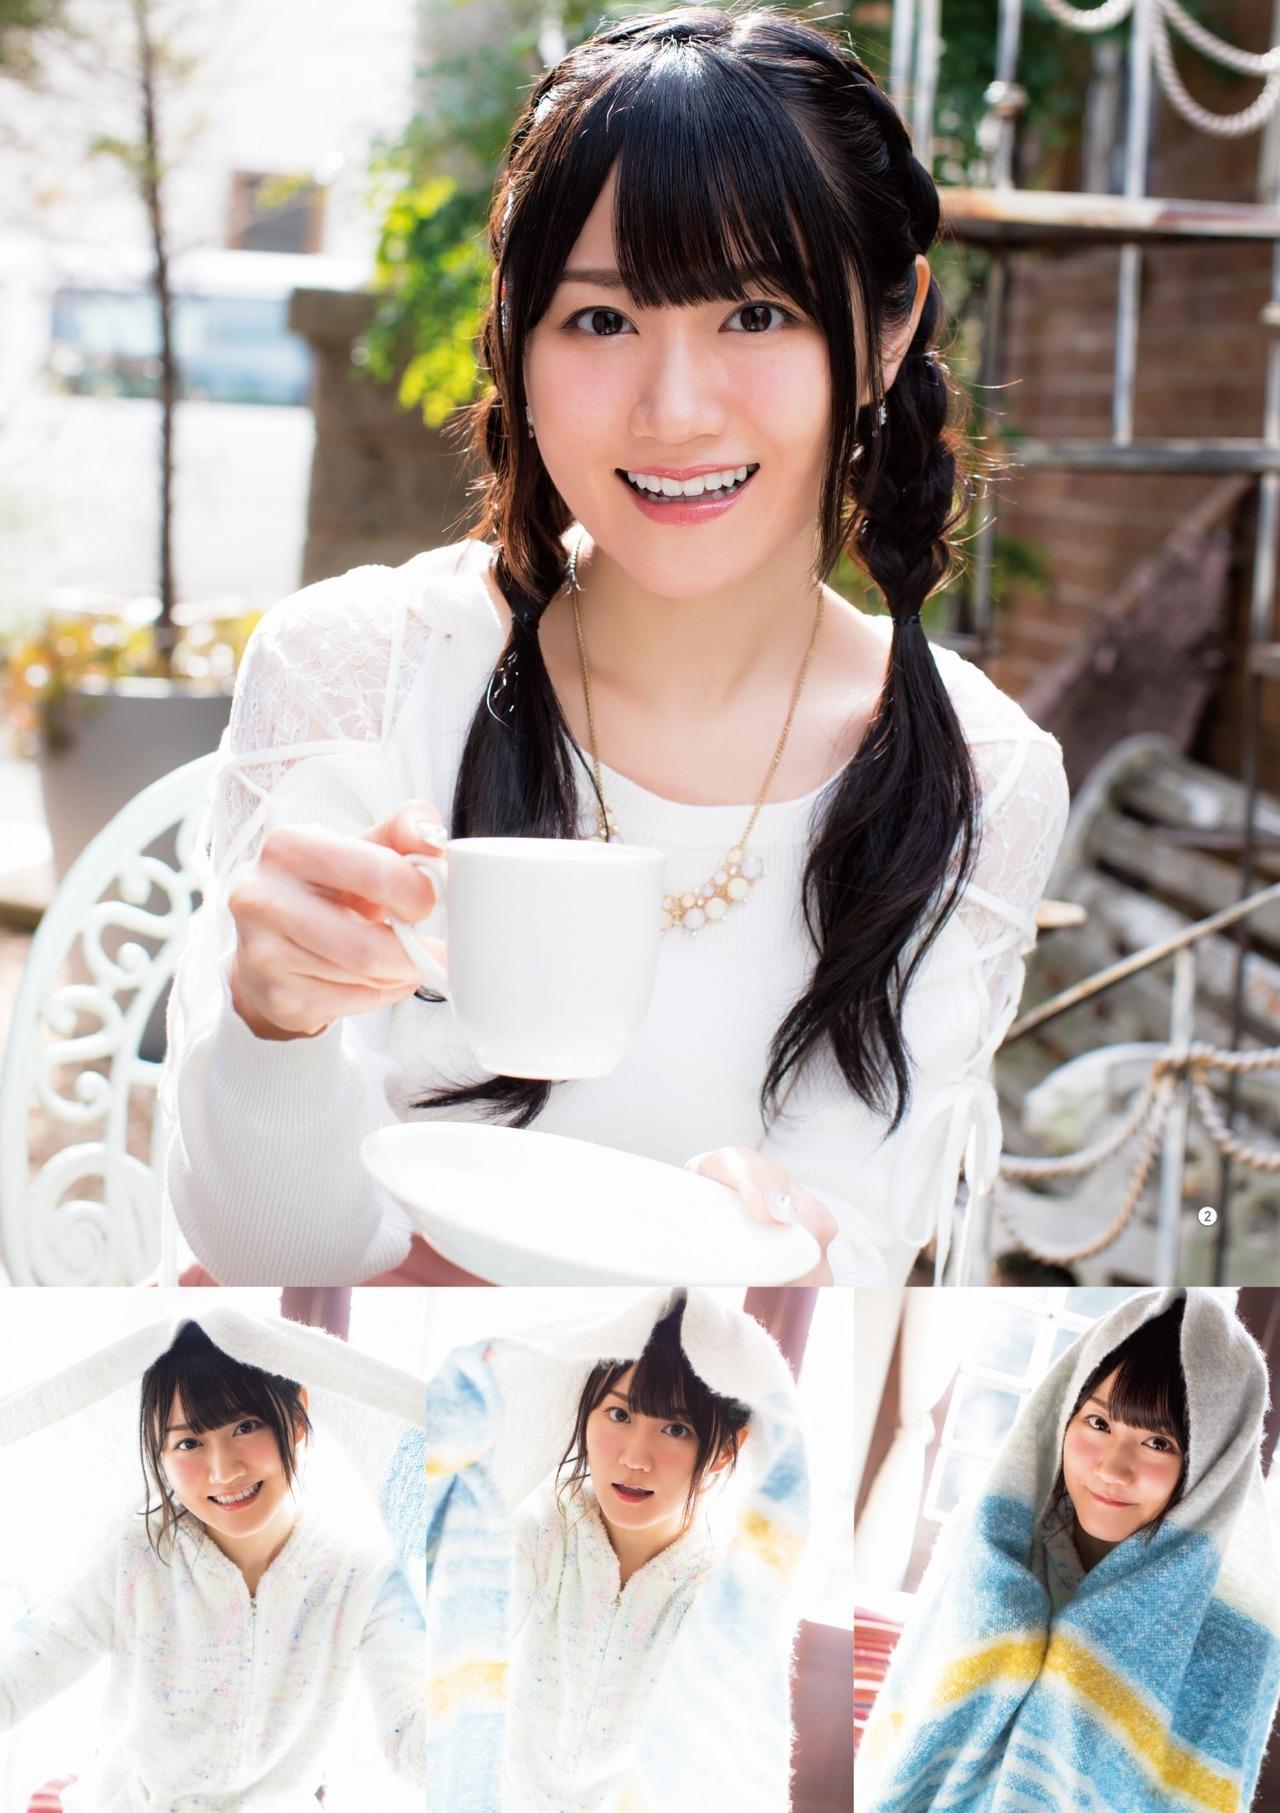 ogura_yui128.jpg